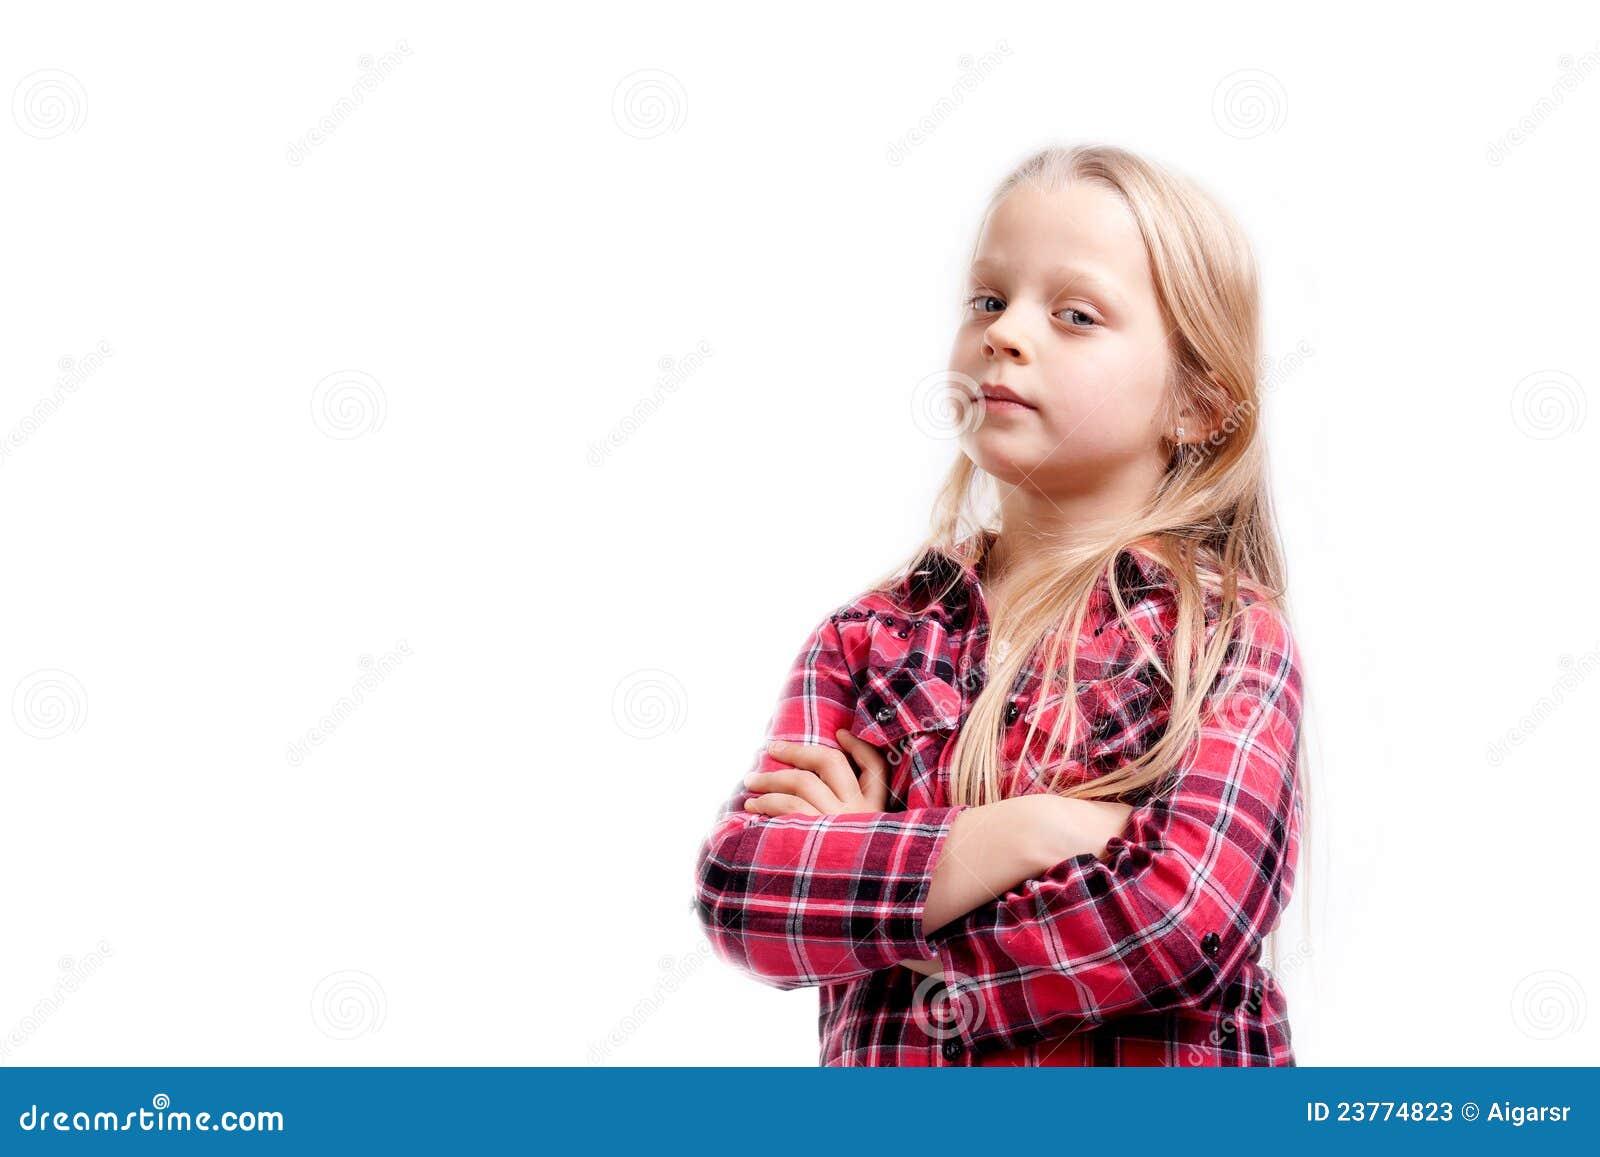 very small girls porrn